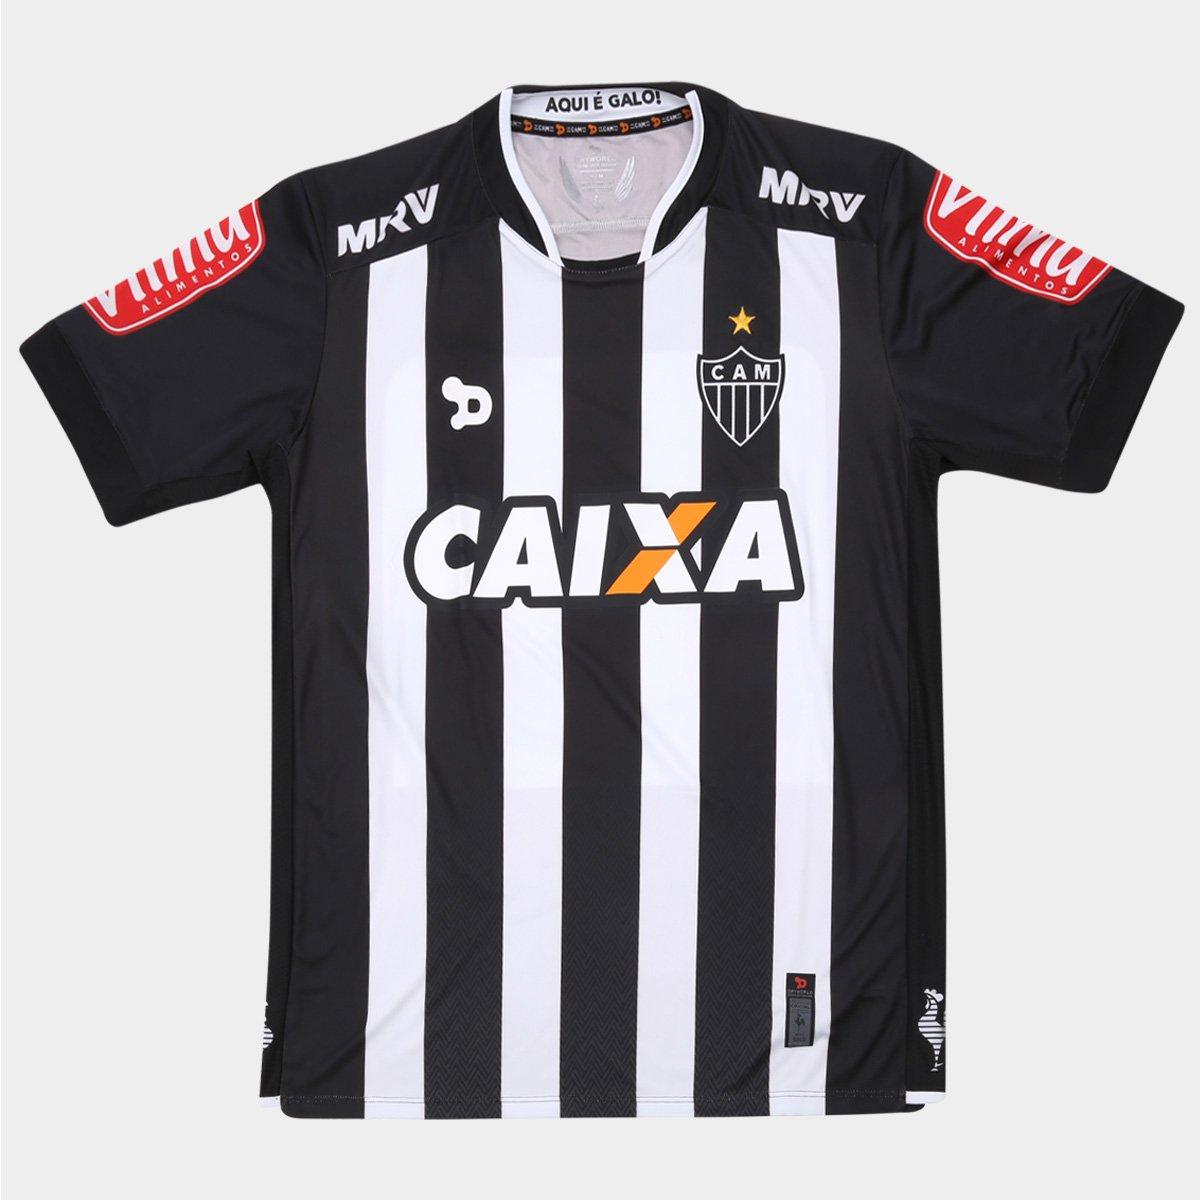 48e2910ee Camisa Atlético-MG I 2016 s nº Torcedor Dryworld Masculina - Compre Agora